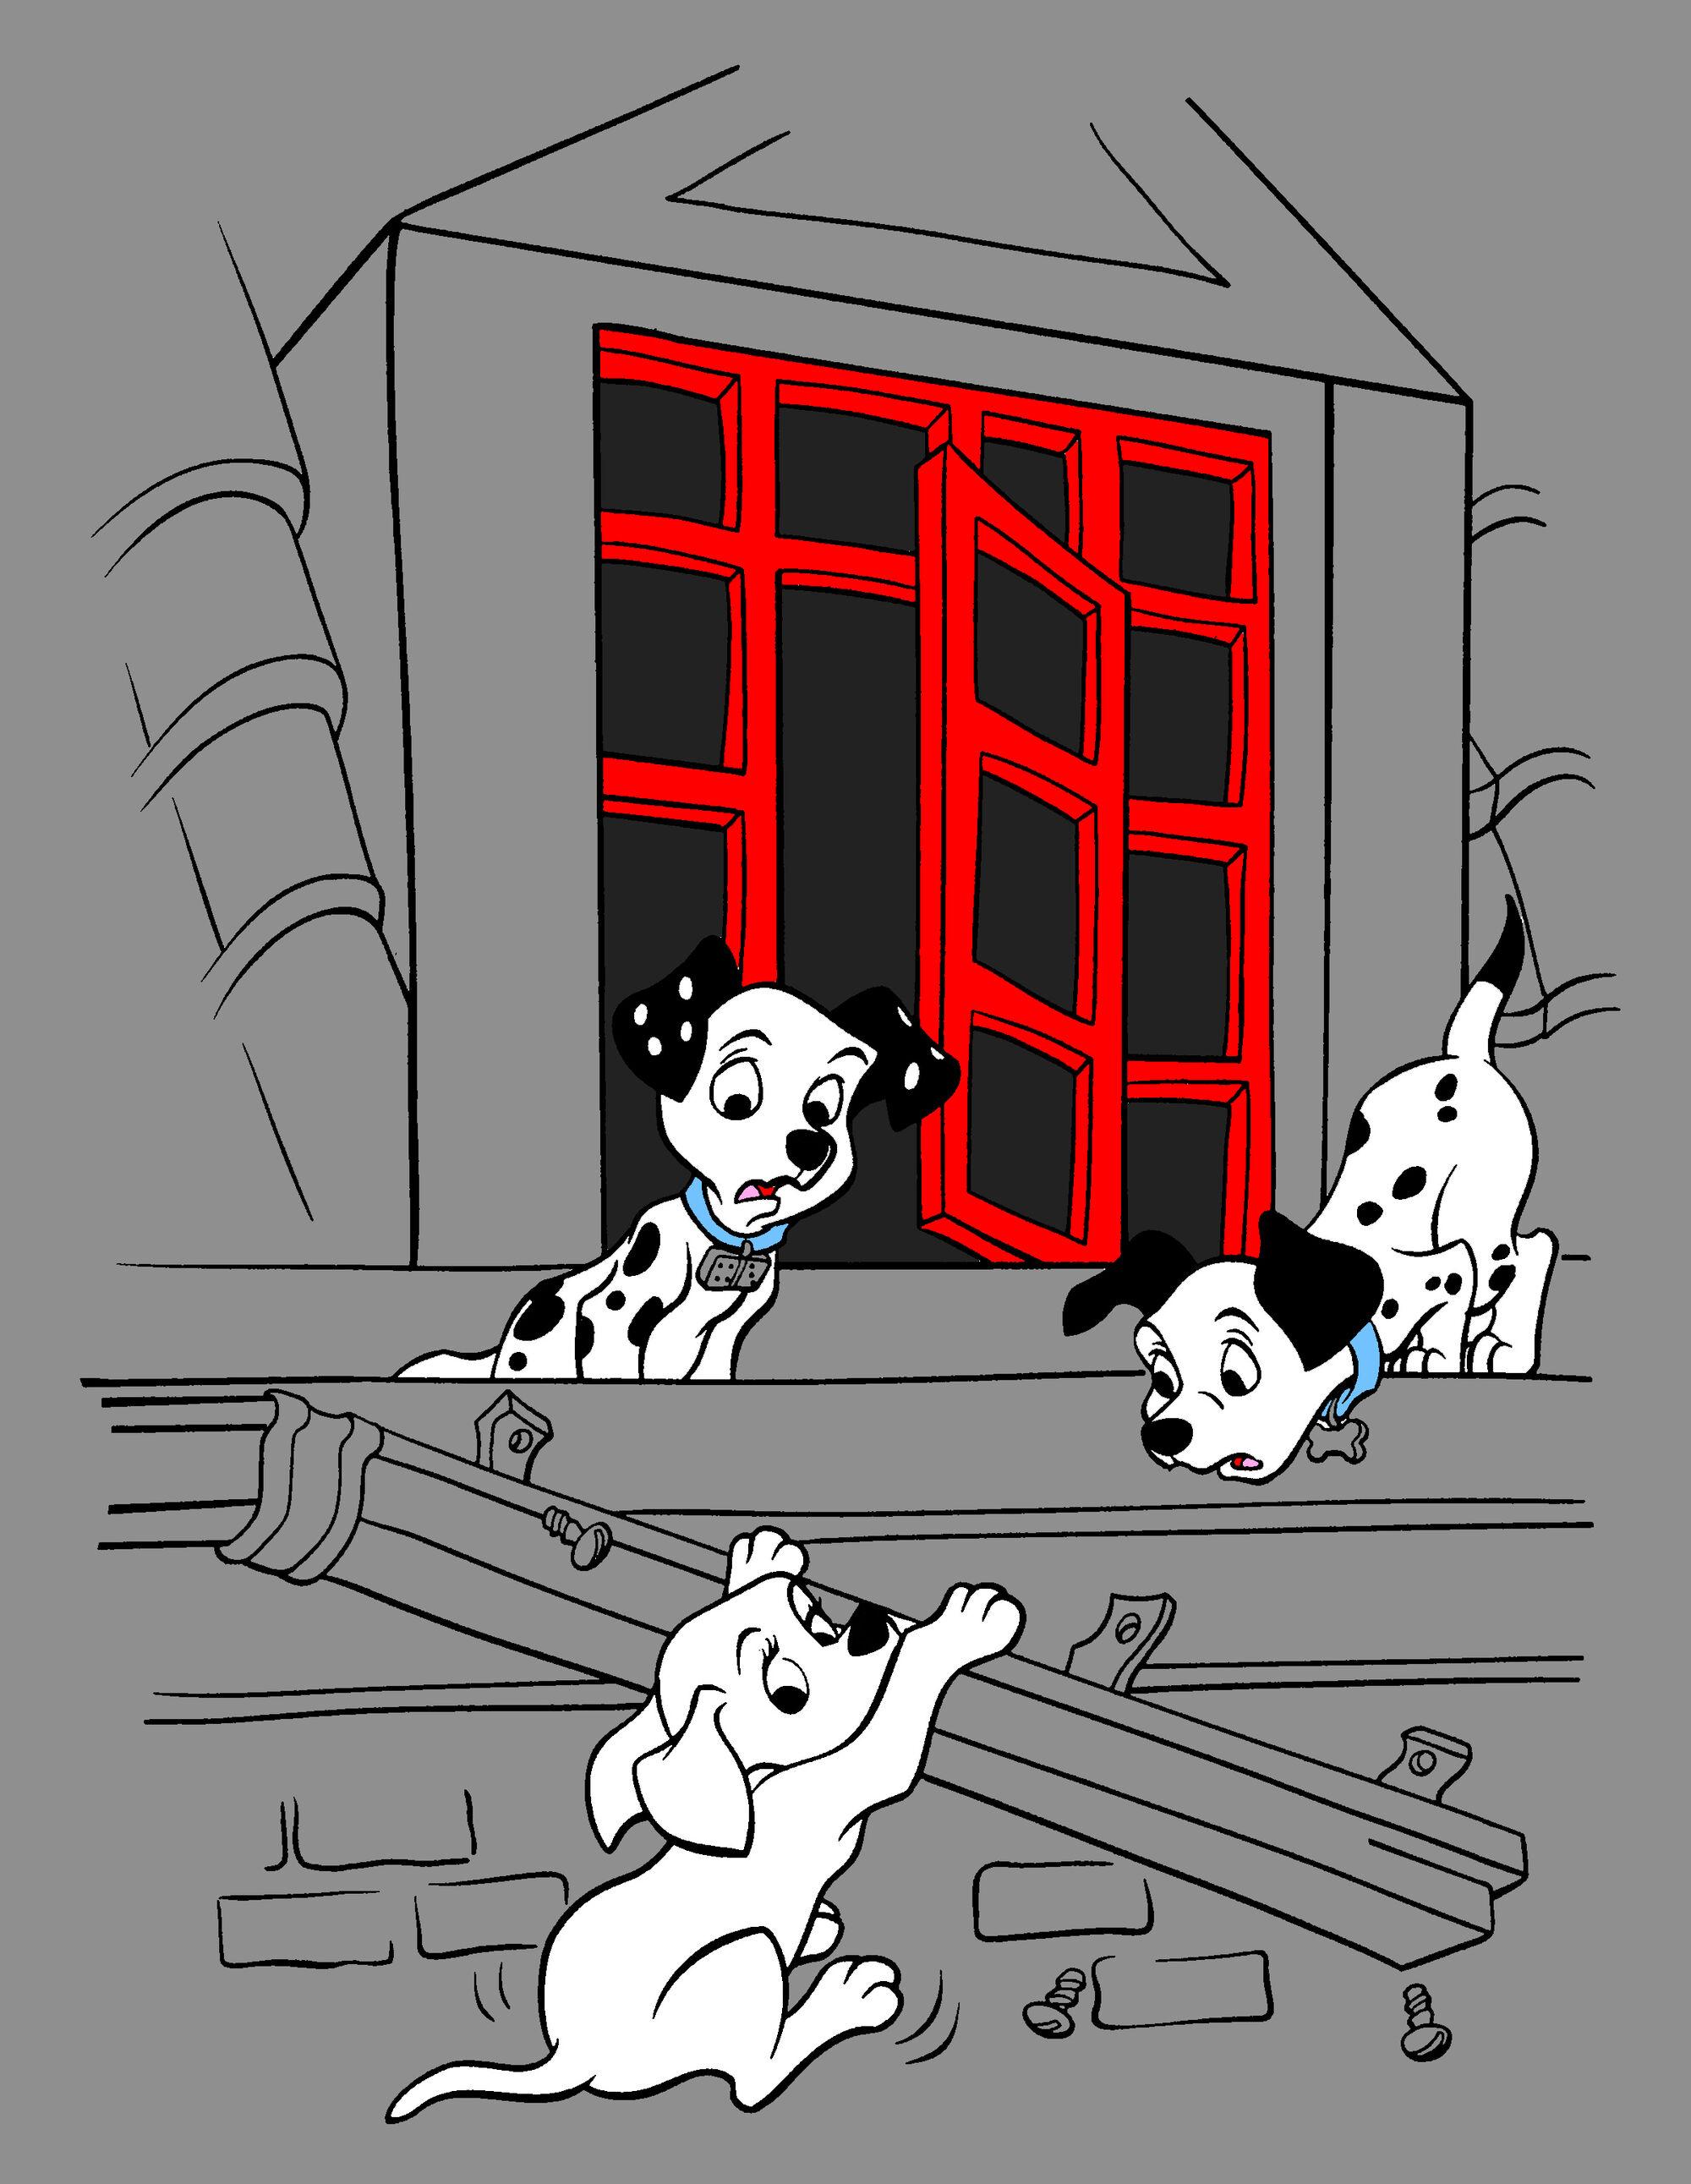 102 dalmatian coloring pages - image 102 dalmatians coloring pages disney wiki